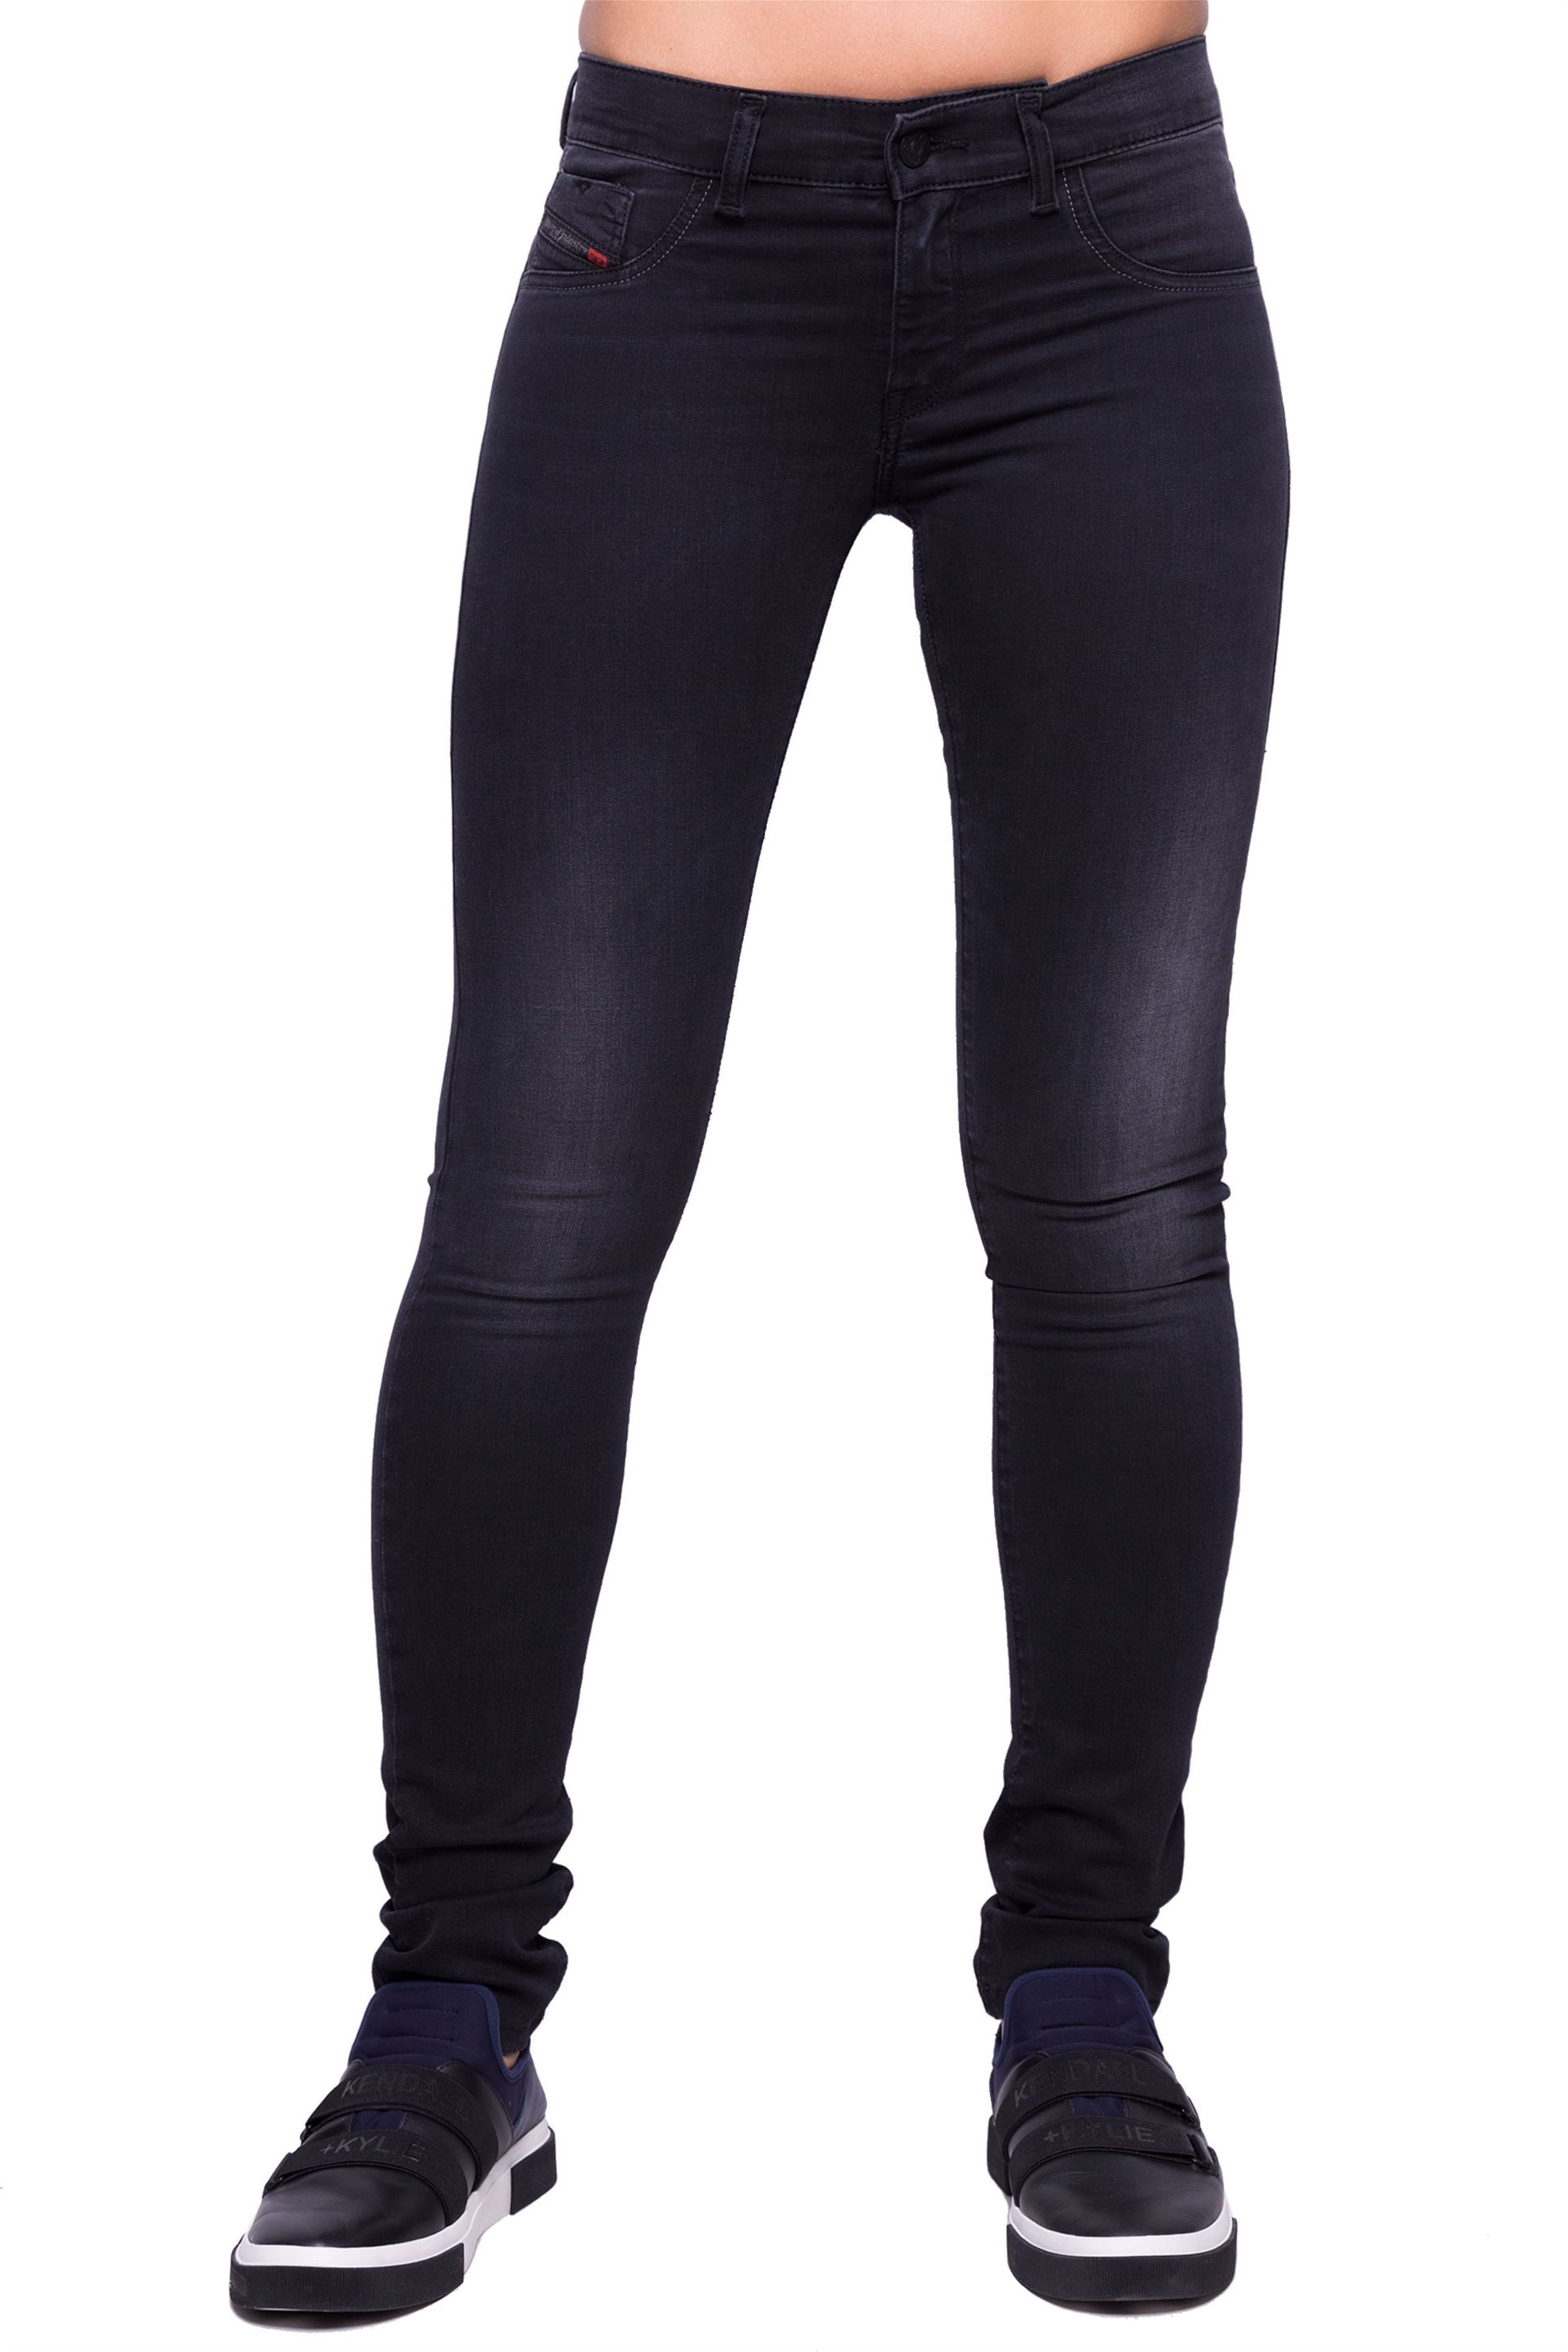 96a7dc2db3b Παντελόνι | Γυναικεία Παντελόνια (Ταξινόμηση: Δημοφιλέστερα ...